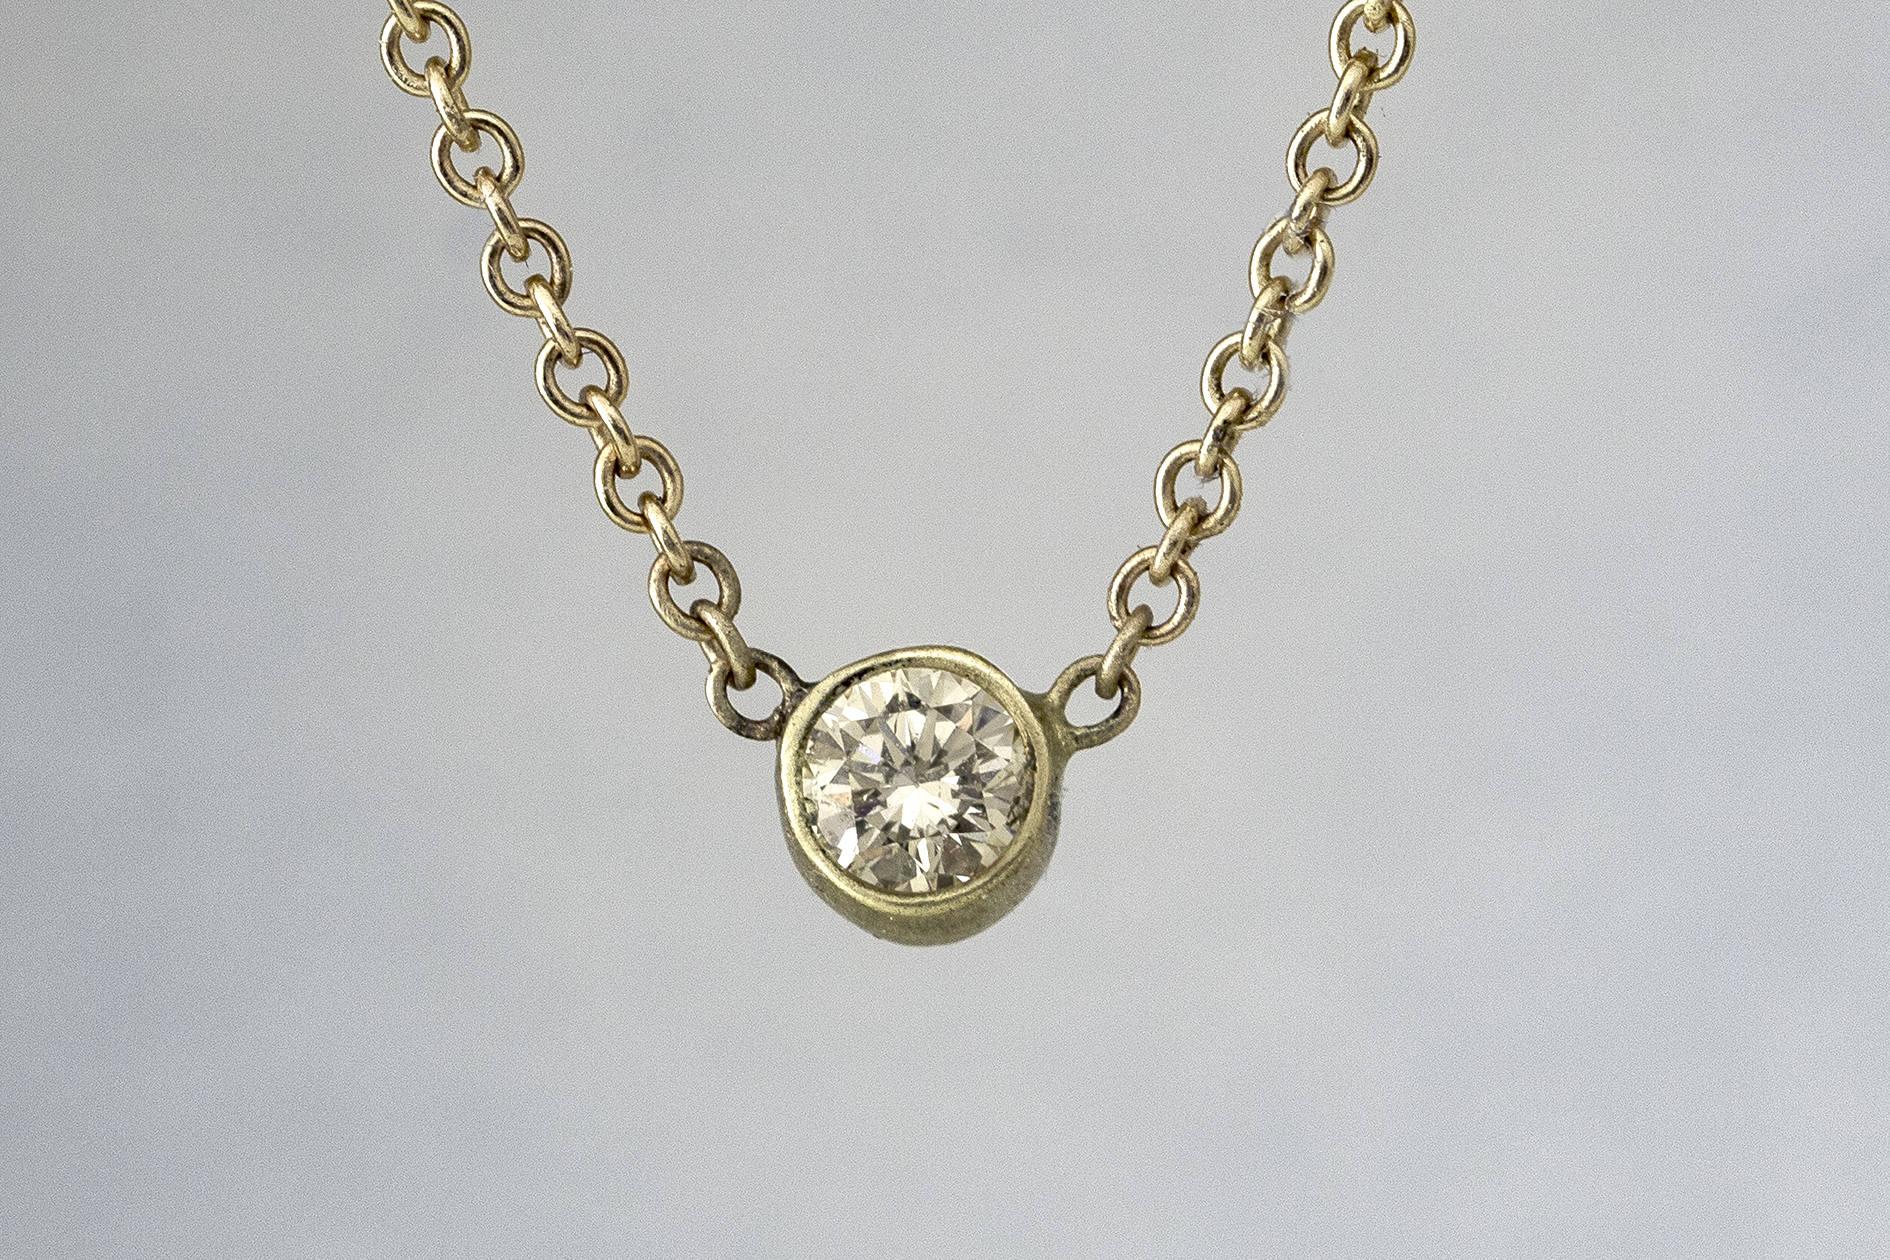 dainty thin round diamond necklace gold diamond pendant. Black Bedroom Furniture Sets. Home Design Ideas